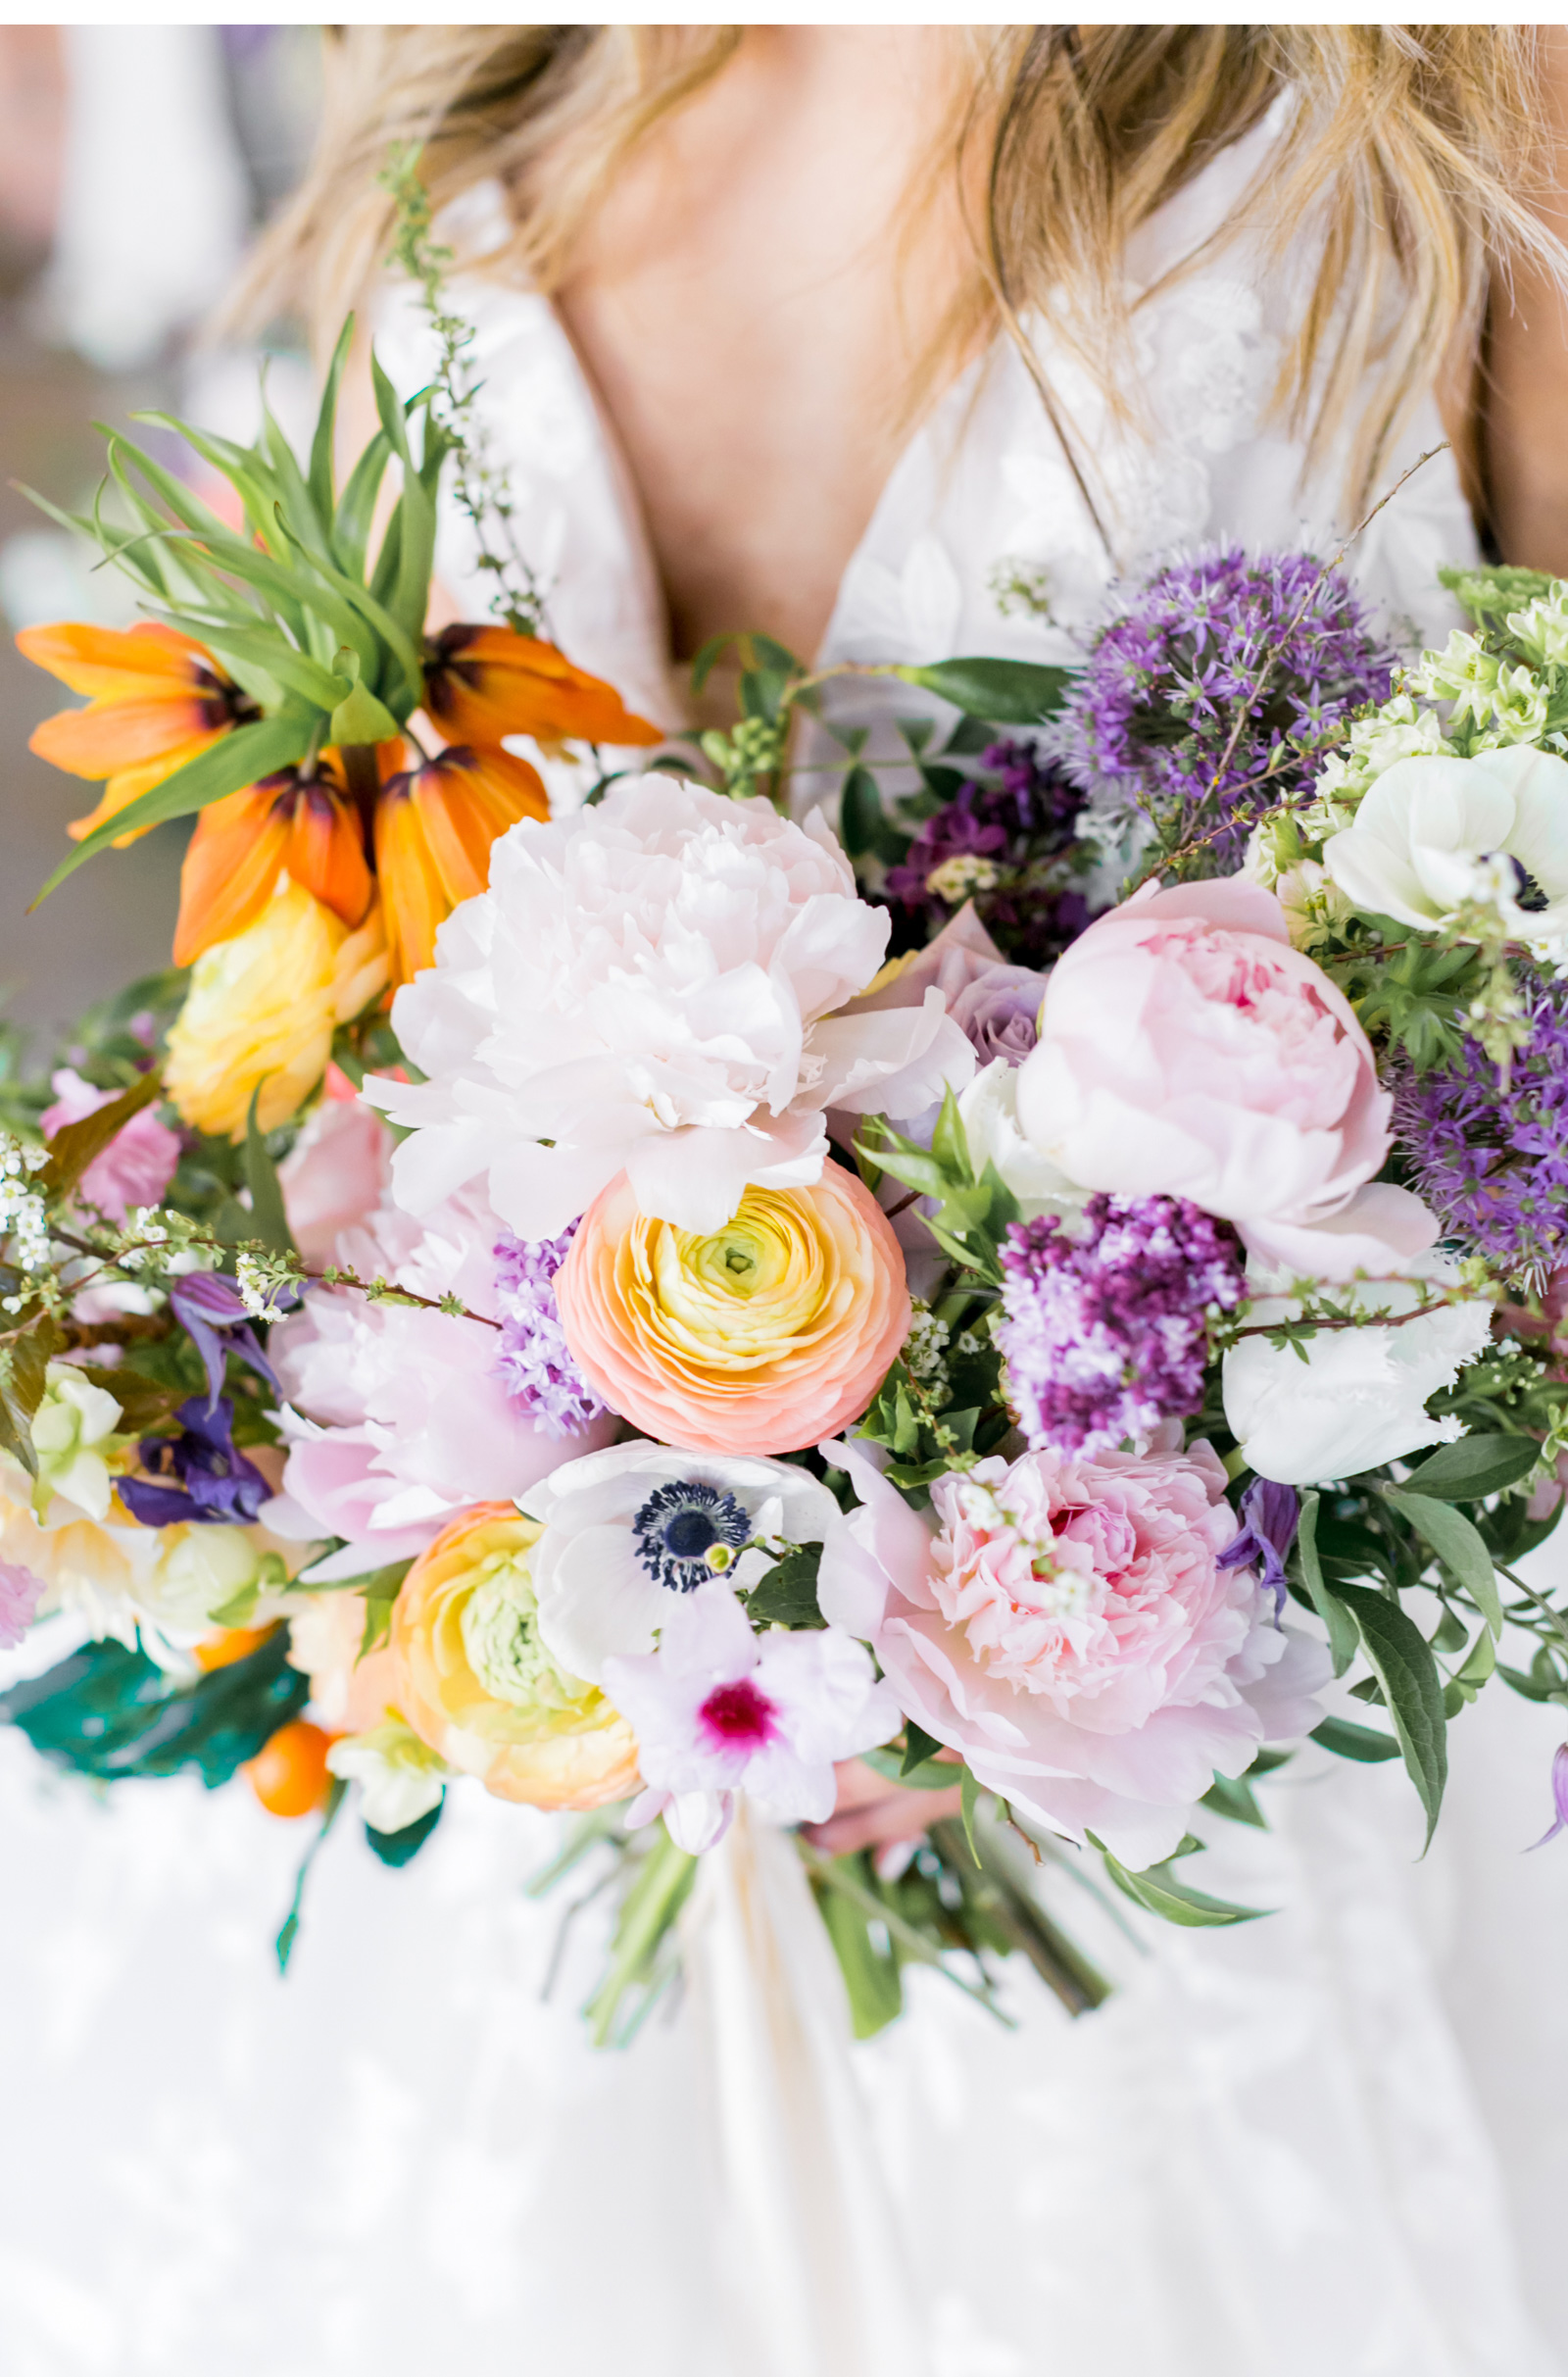 Malibu-Weddings-Natalie-Schutt-Photography-Inspired-by-This_08.jpg